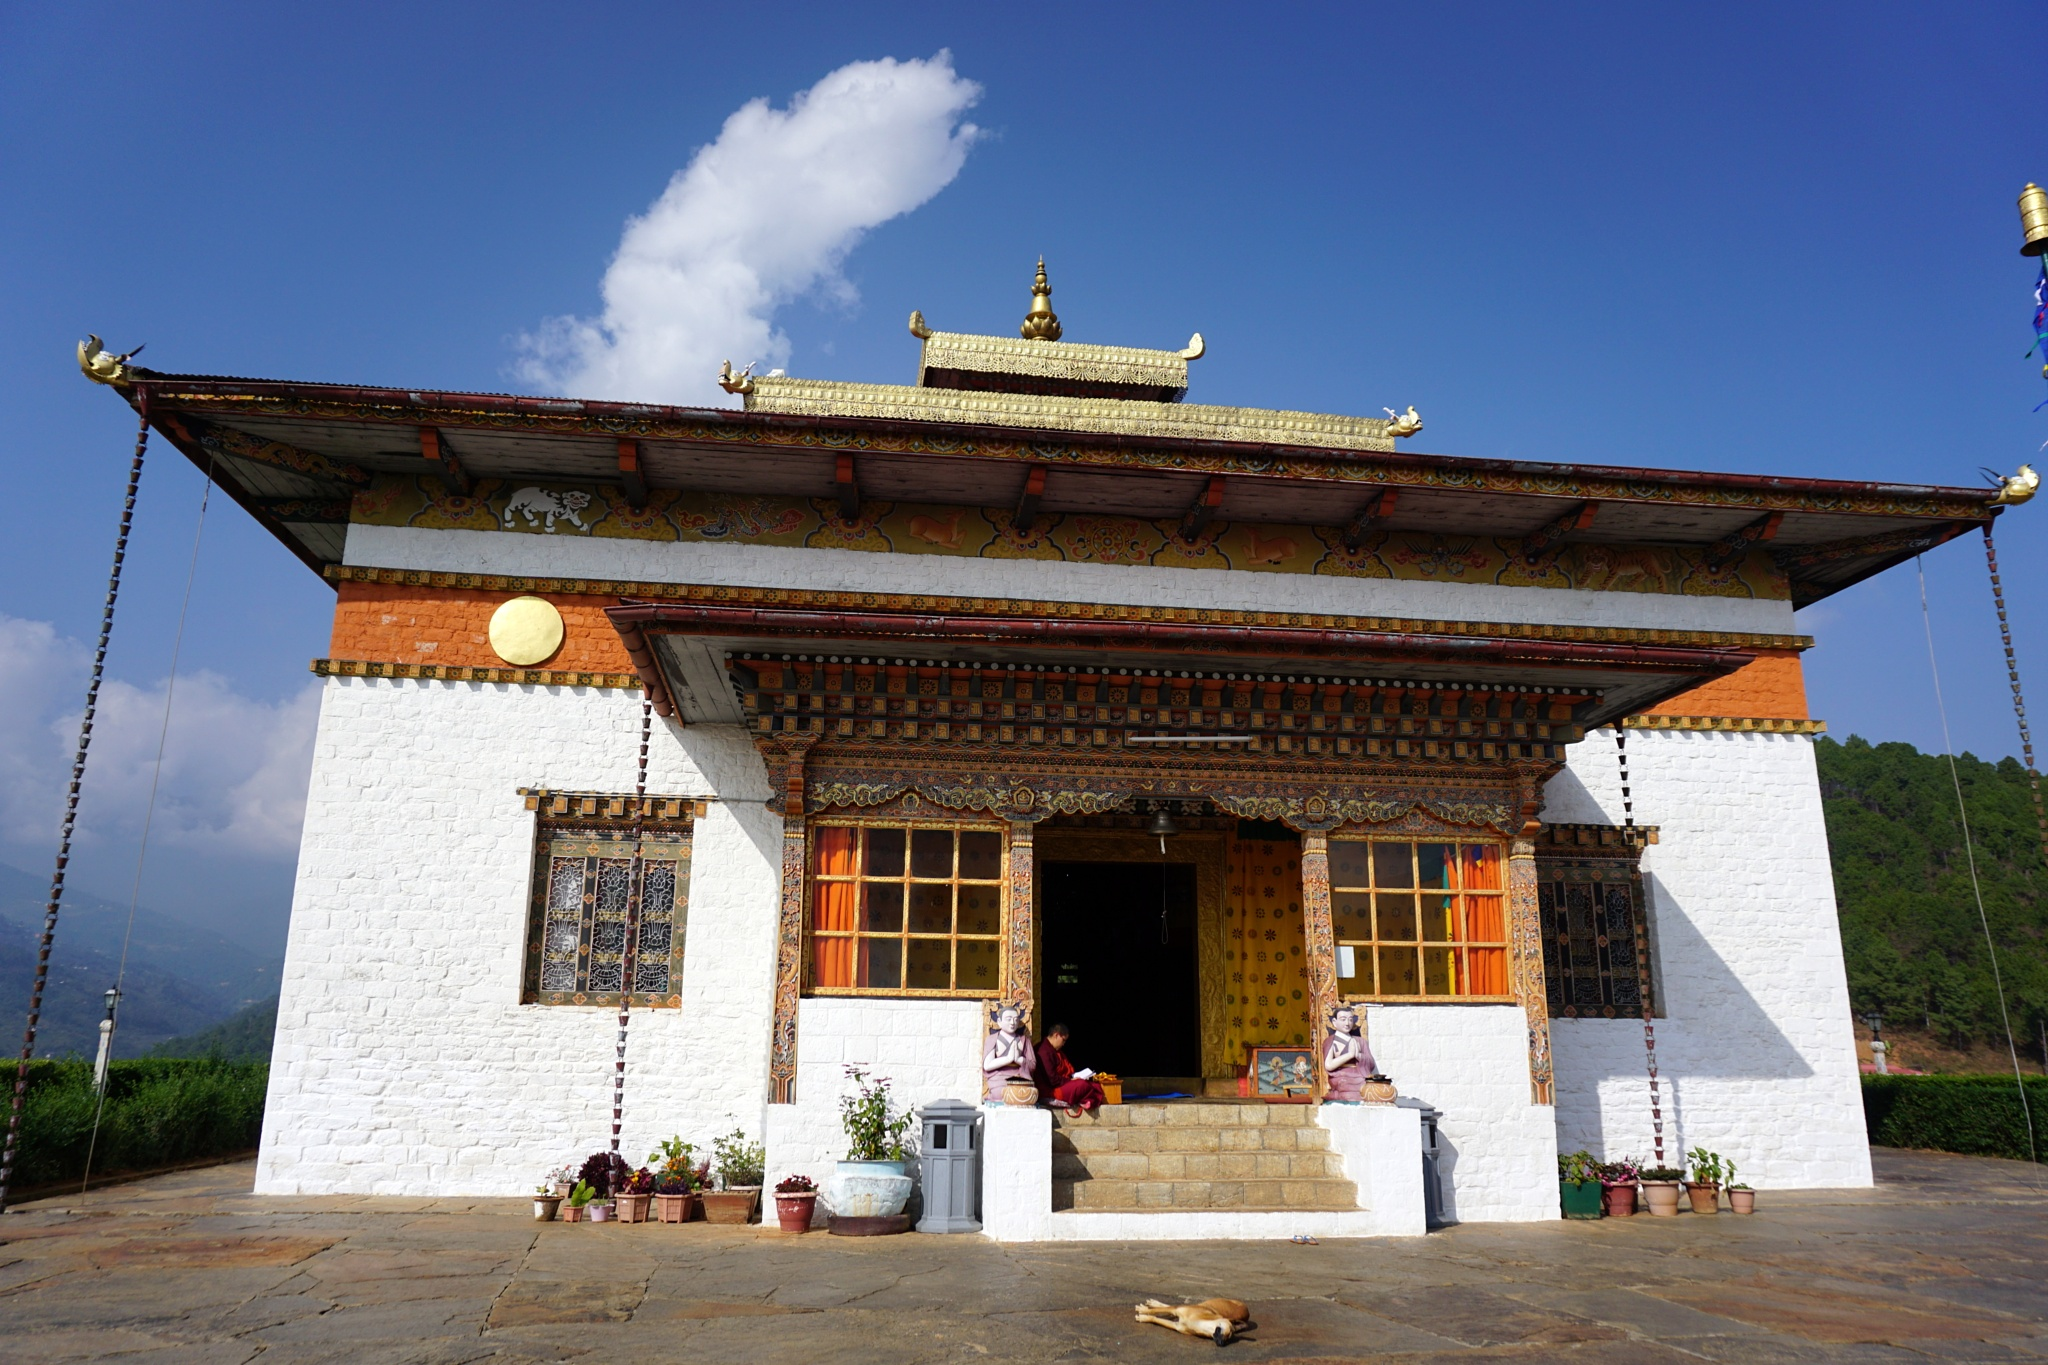 Sangchhen Dorji Lhuendrup Lhakhang (Nunnery) by prasadkotian